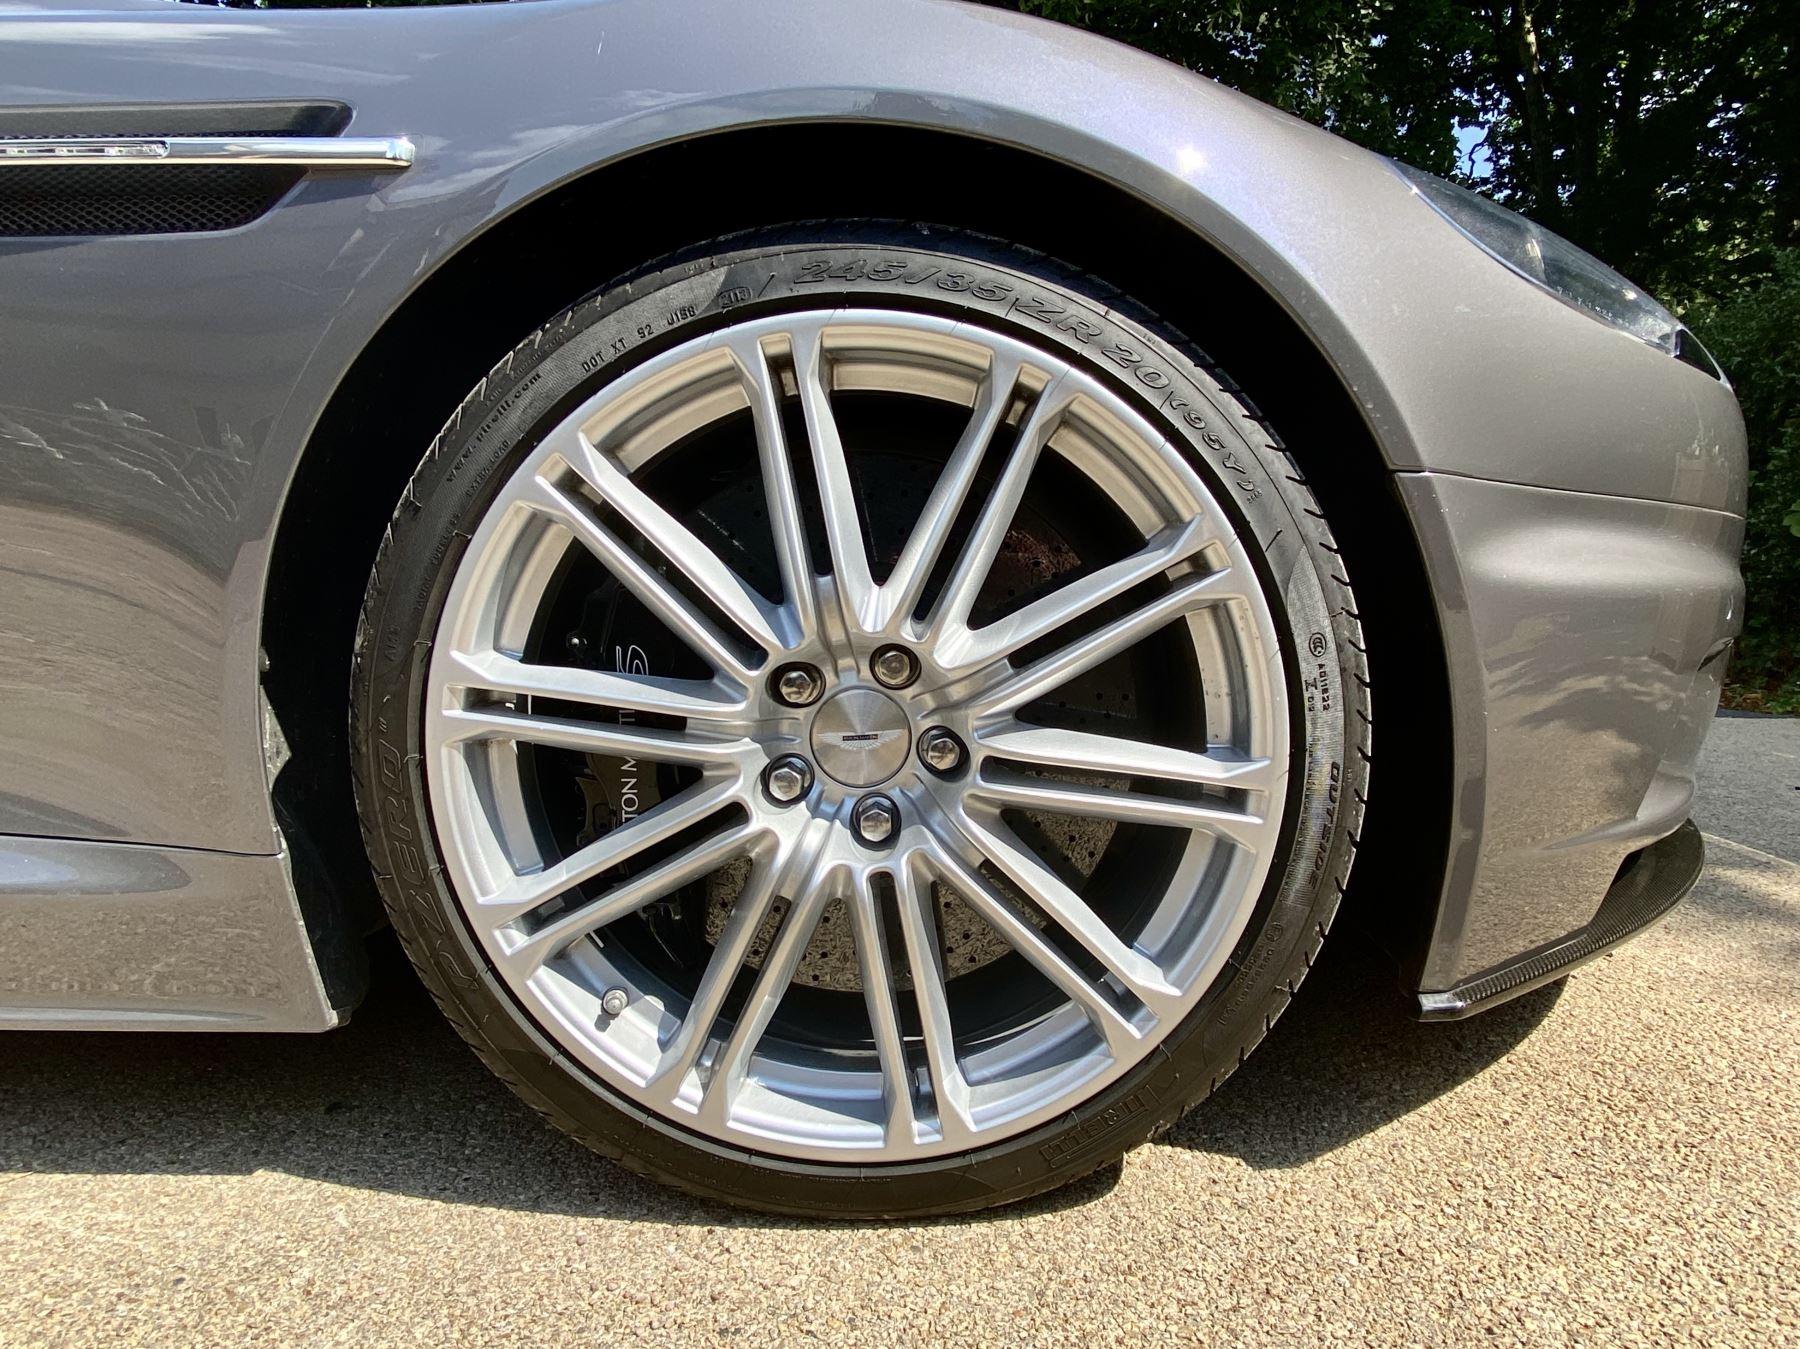 Aston Martin DBS V12 2dr image 10